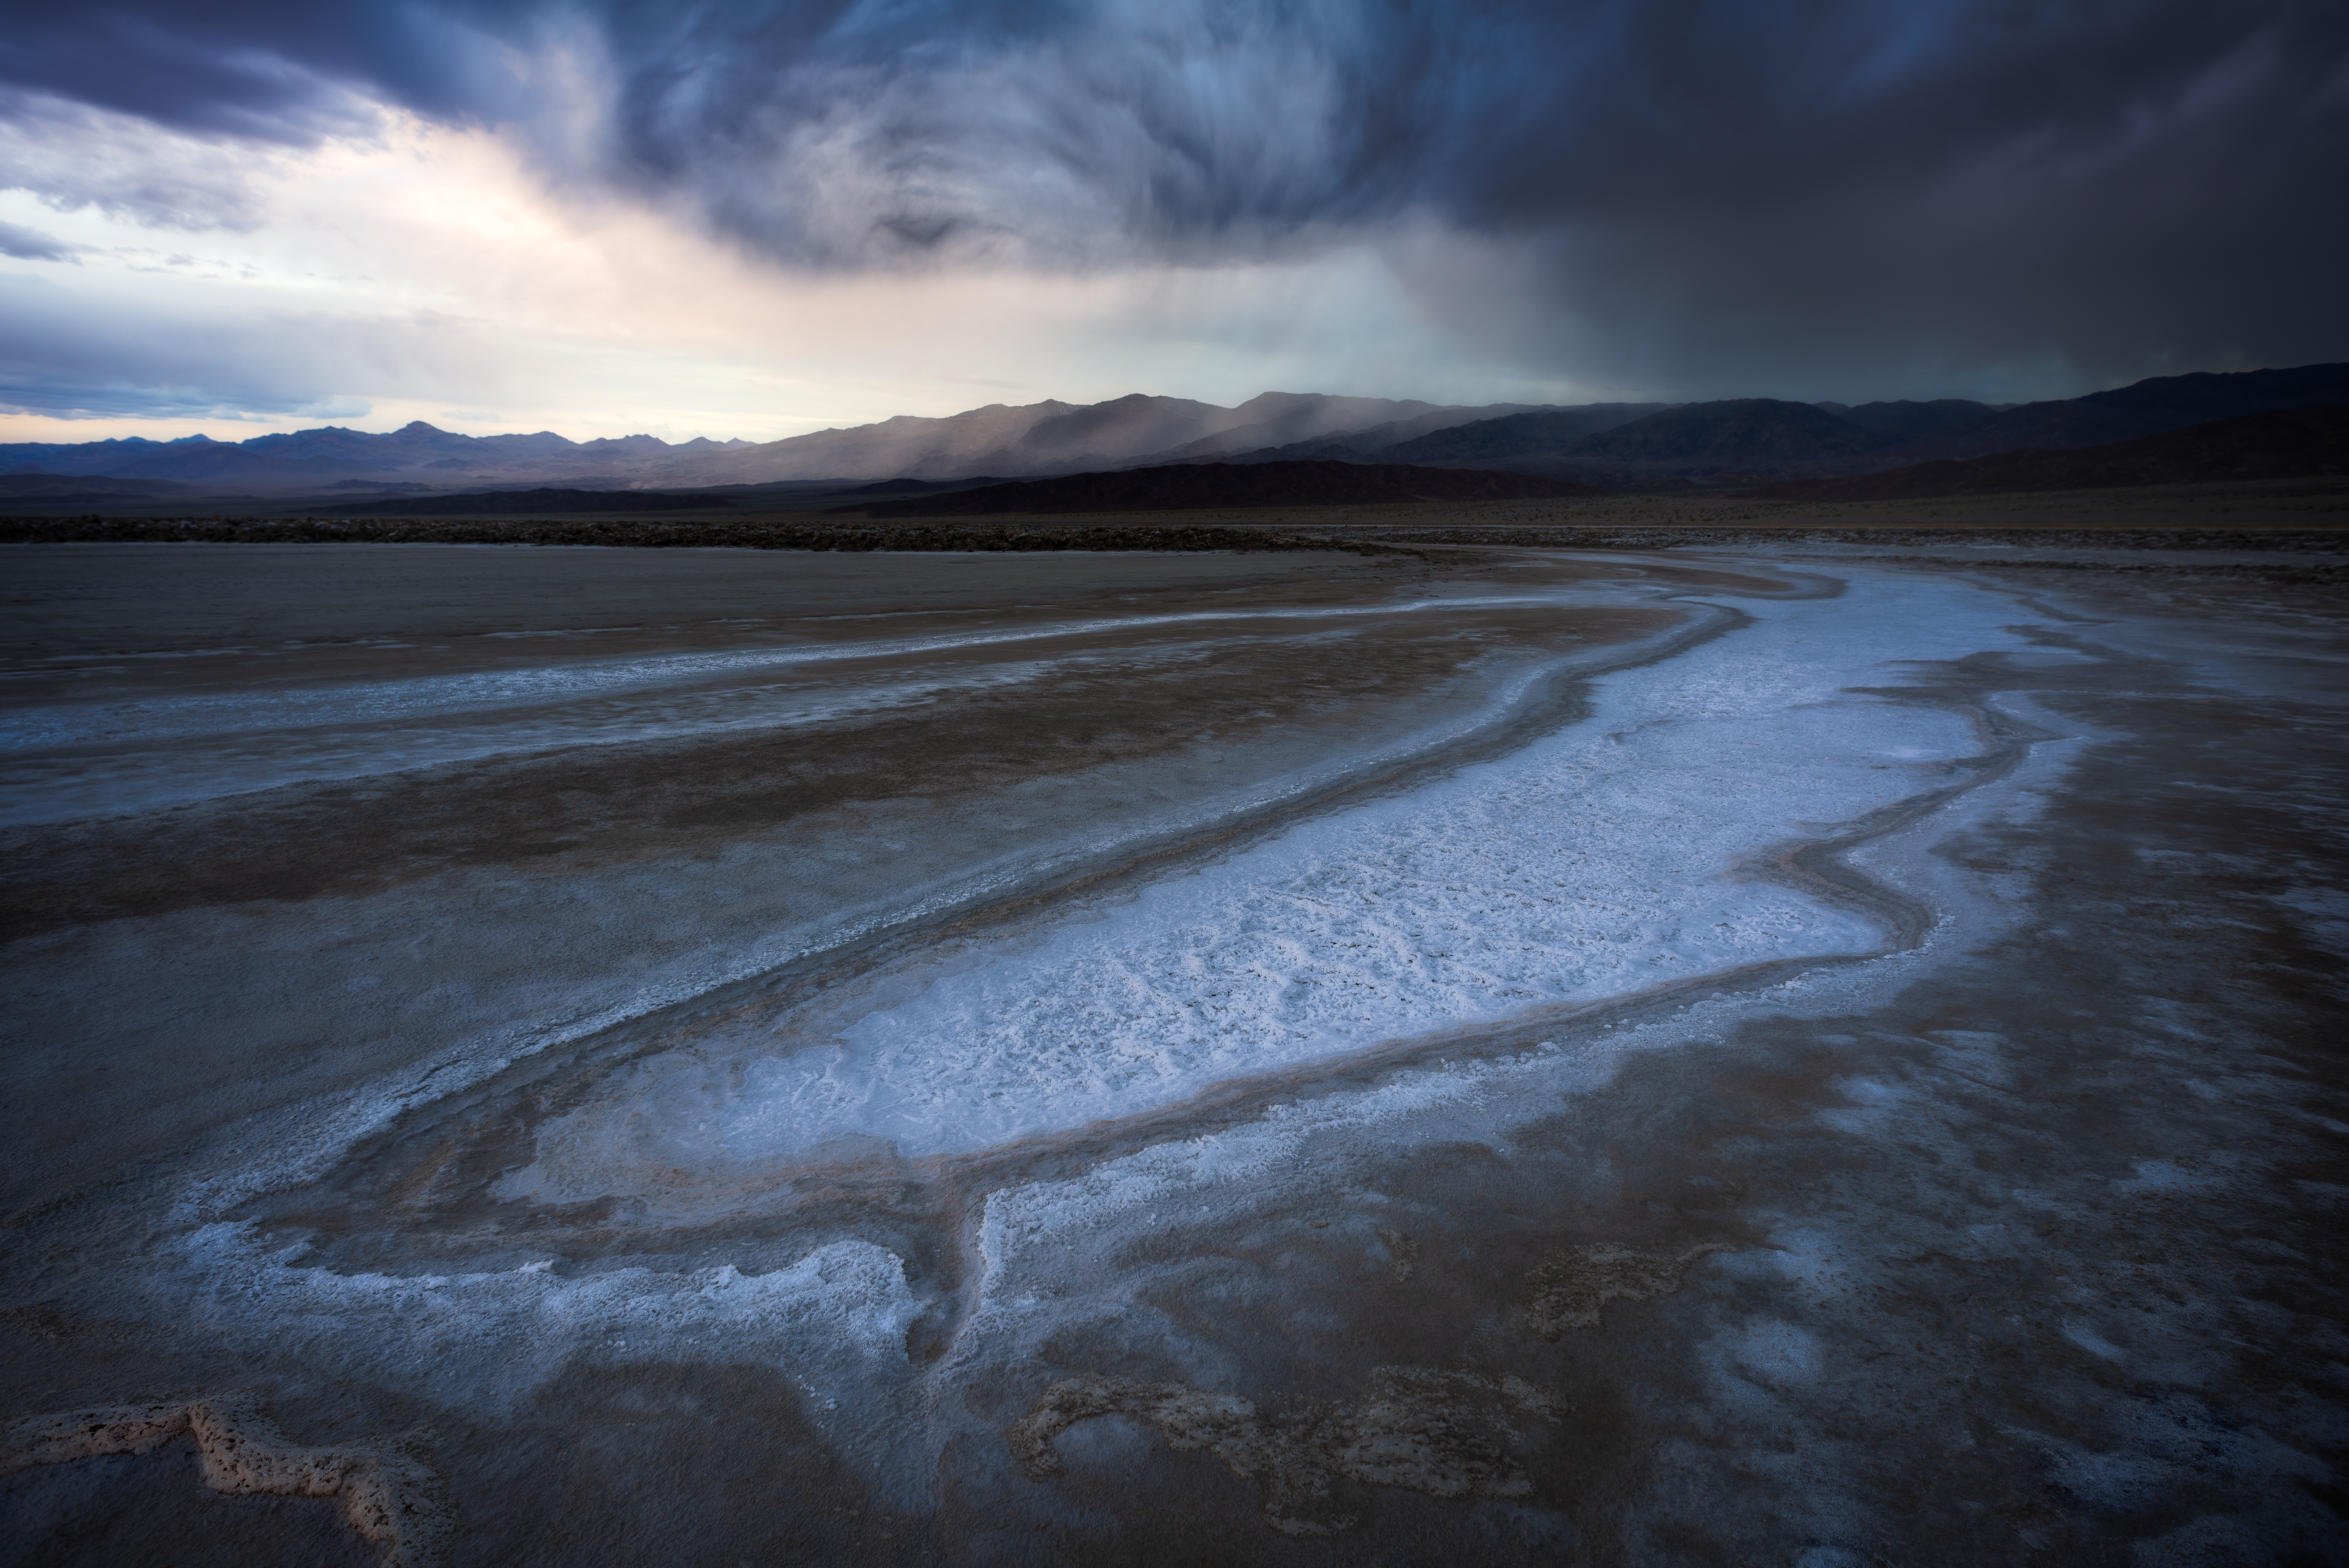 JR_DValley_Badwater_Basin-